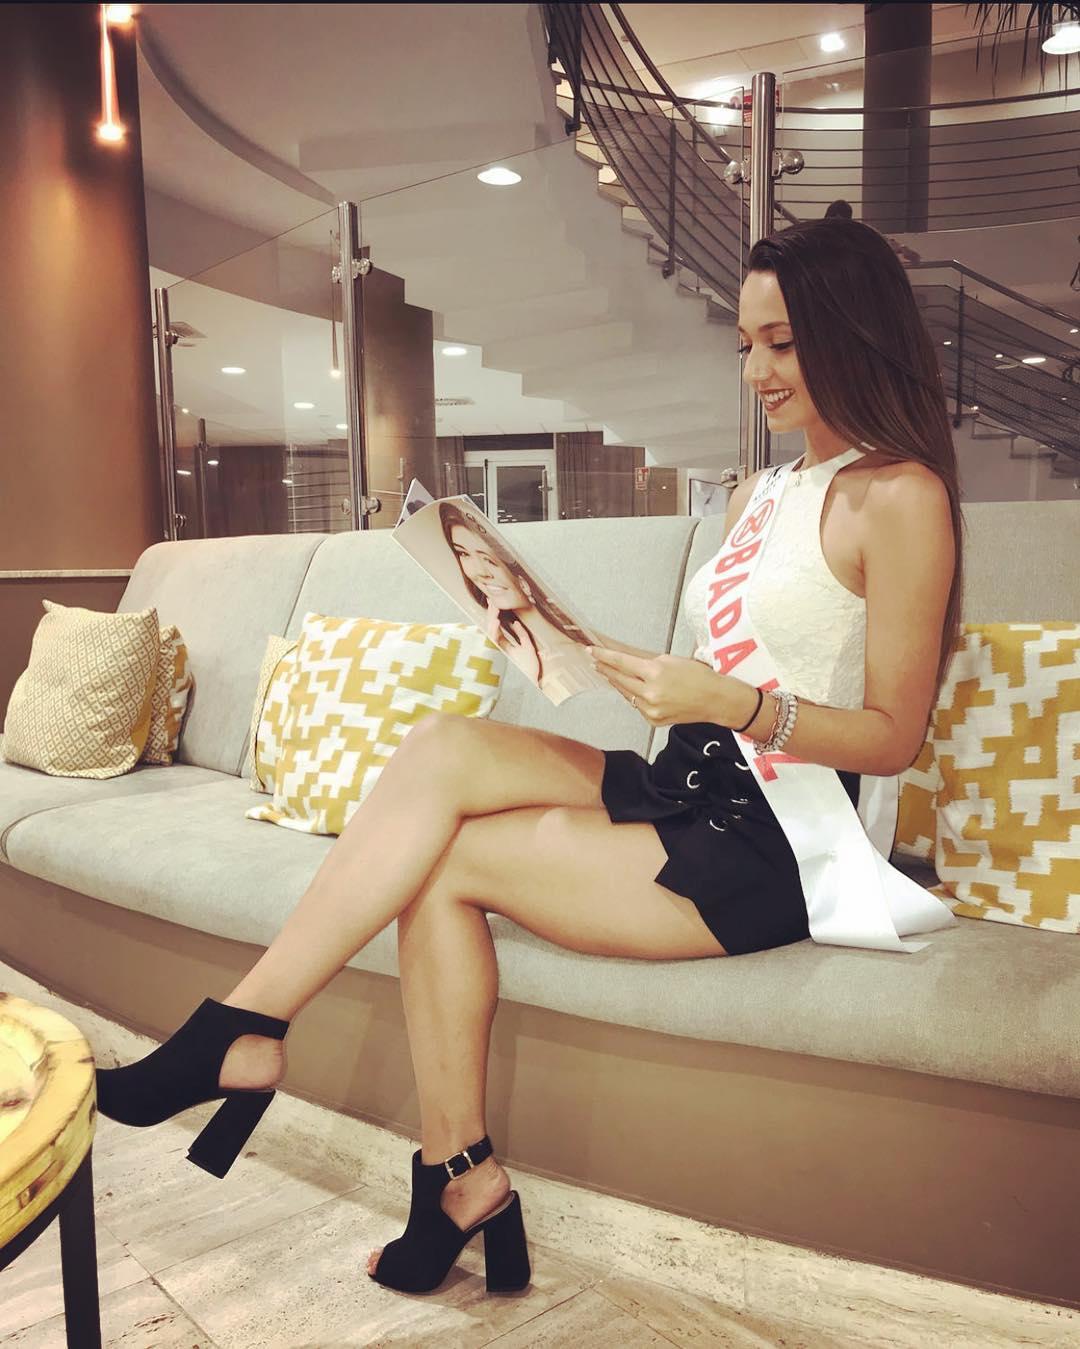 miss world badajoz 2018. Kgvr8r8s